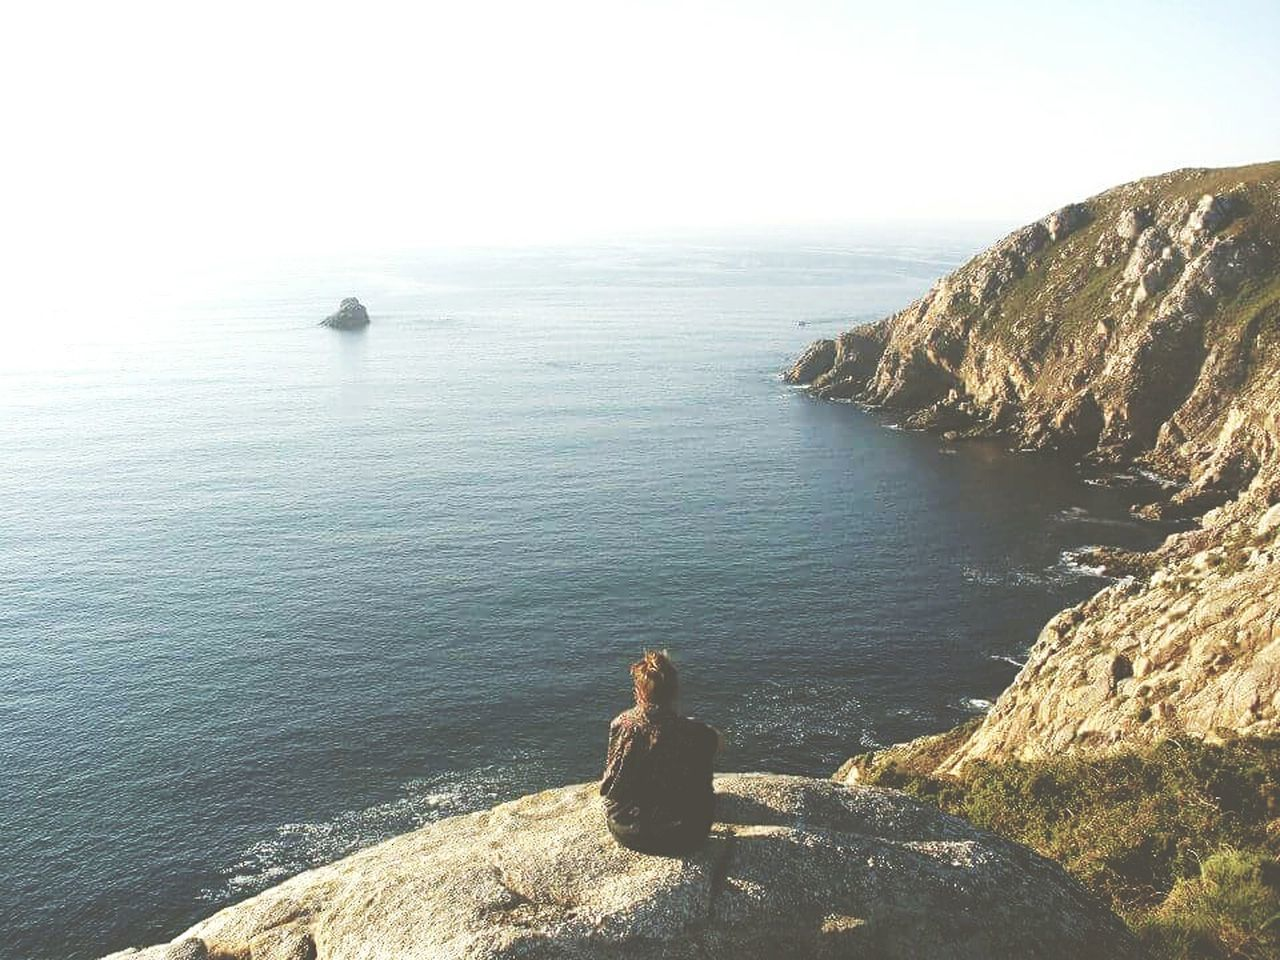 Galicia Galicia, Spain Endoftheworld Endoftheday Endoftheroad CaminodeSantiago Caminofrances El Camino De Santiago Camino De Santiago Ocean Ocean View Ocean❤ Rest Sunset Camino Alone Spain♥ EyeEm Spain